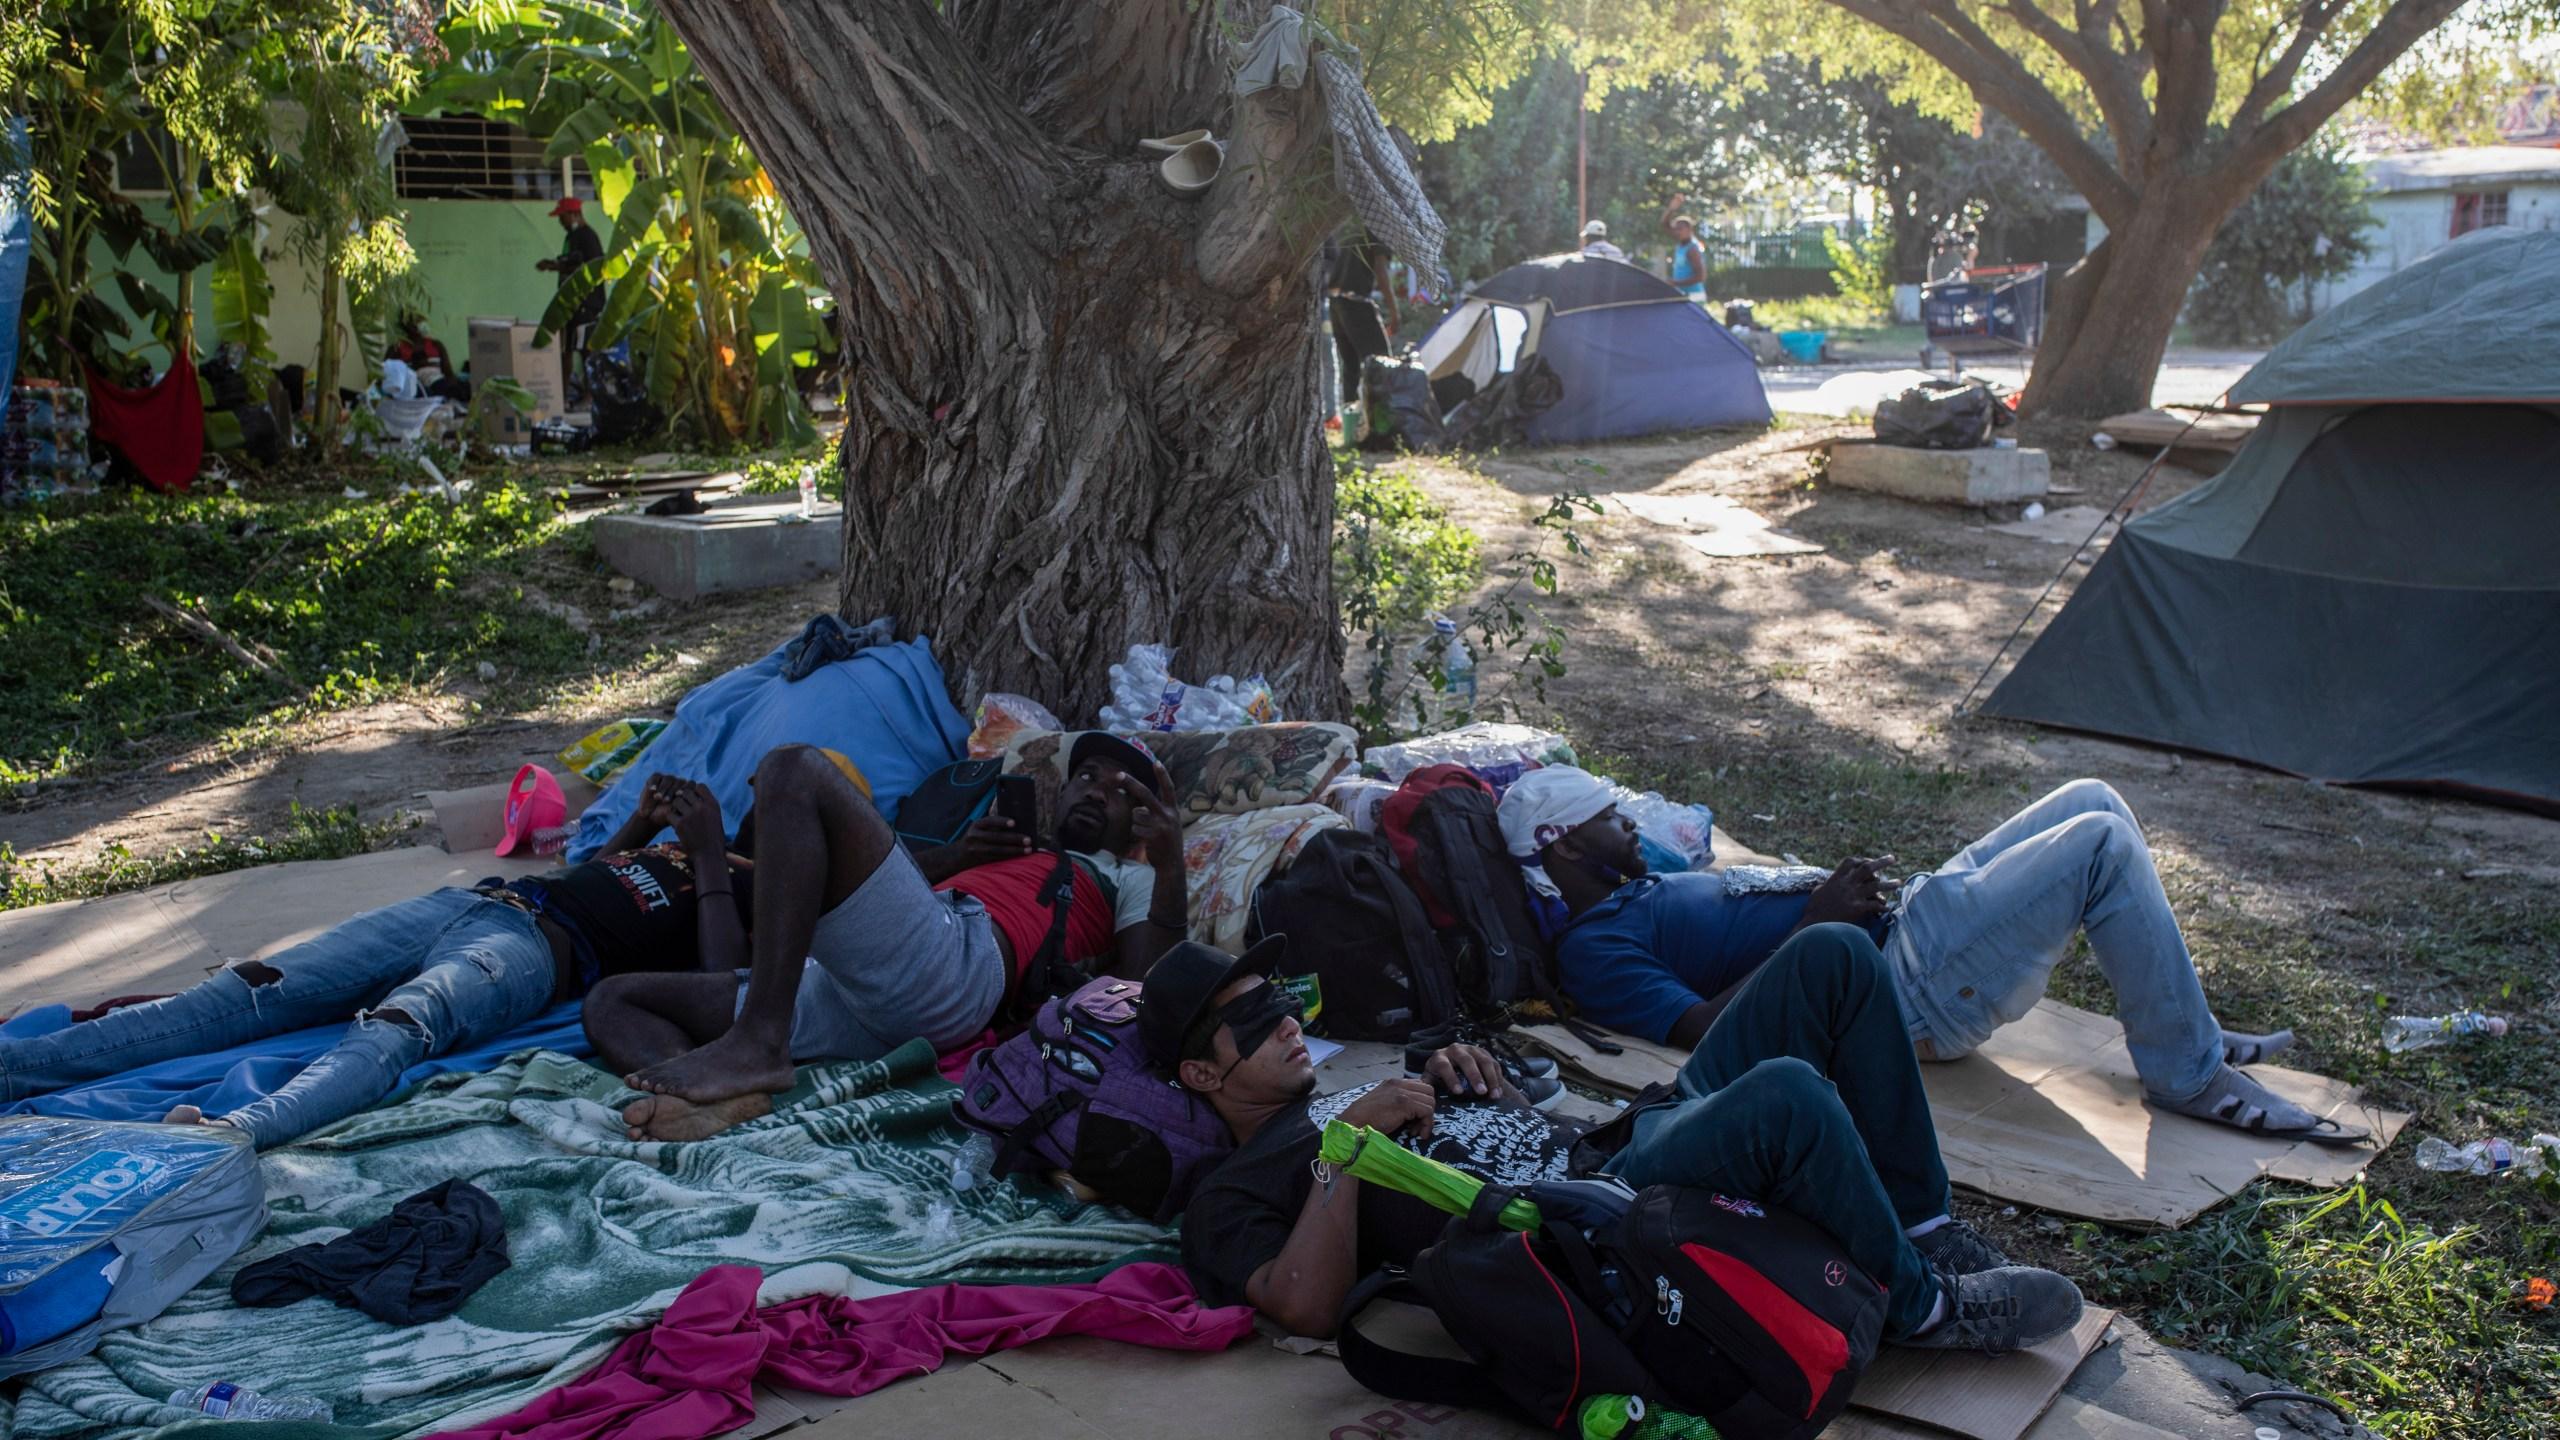 Migrants rest under the shade of a tree in Ciudad Acuna, Mexico, Friday, Sept. 24, 2021, across the Rio Grande from Del Rio, Texas. (AP Photo/Felix Marquez)